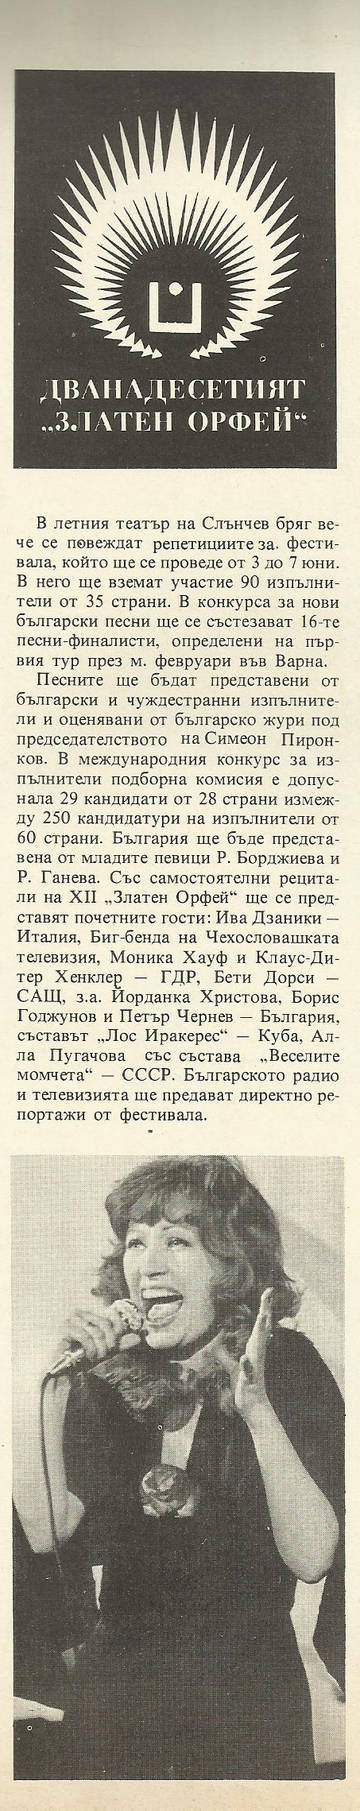 http://s2.uploads.ru/t/1bF0u.jpg